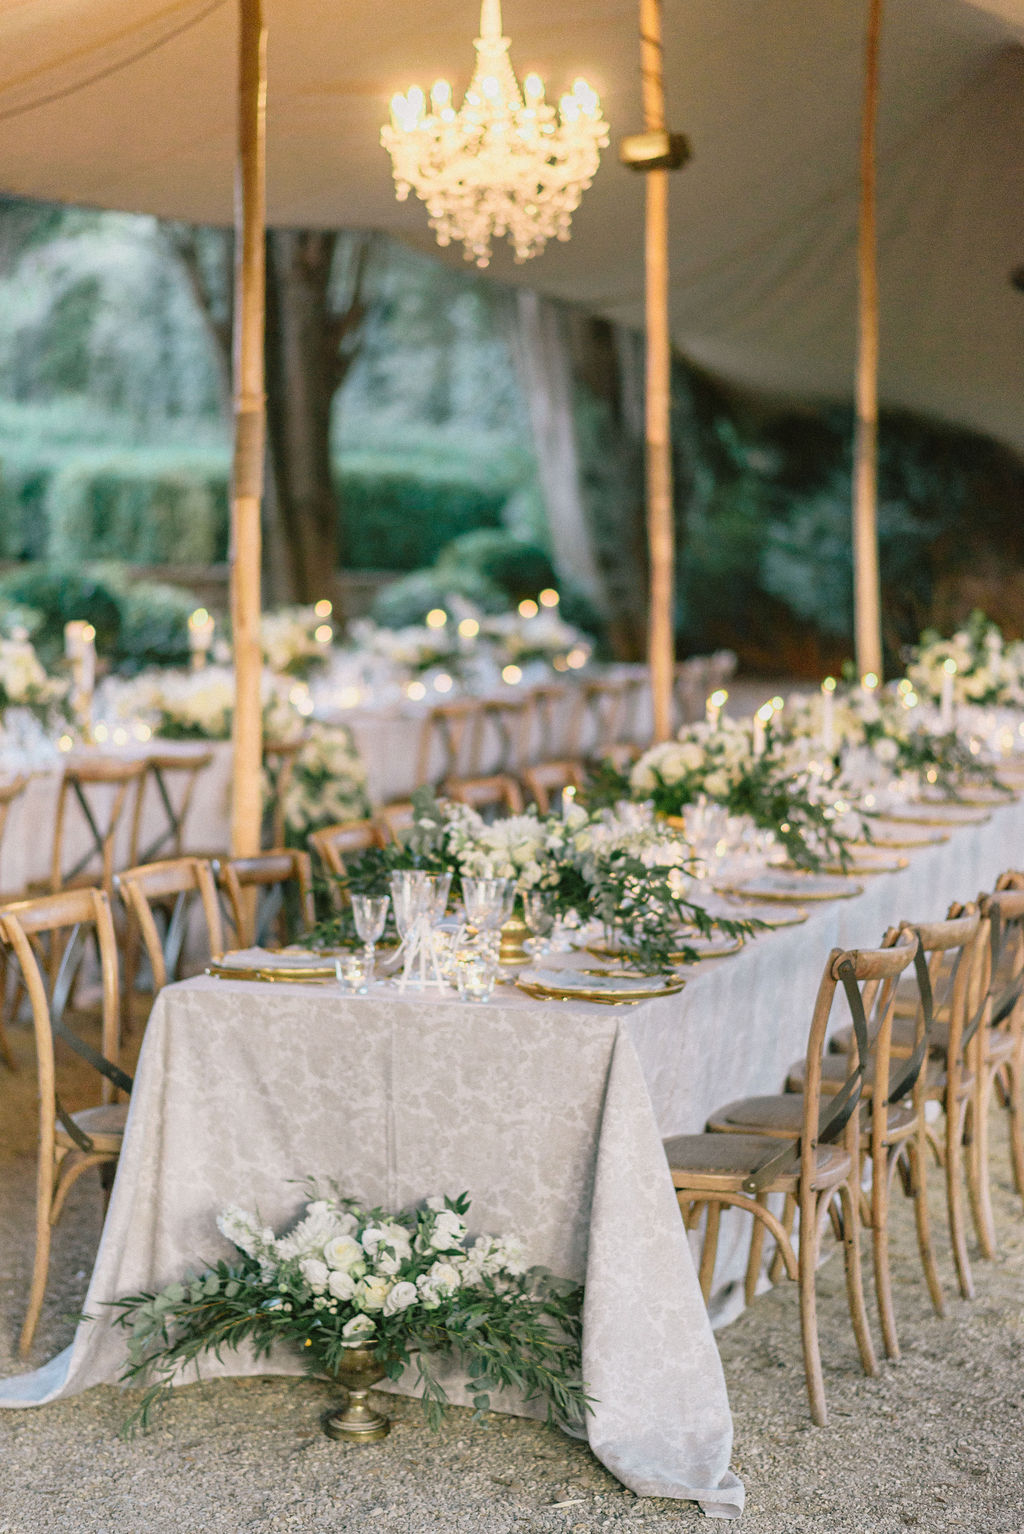 Luxury italy wedding planner Vignamaggio Wedding Dinner setting